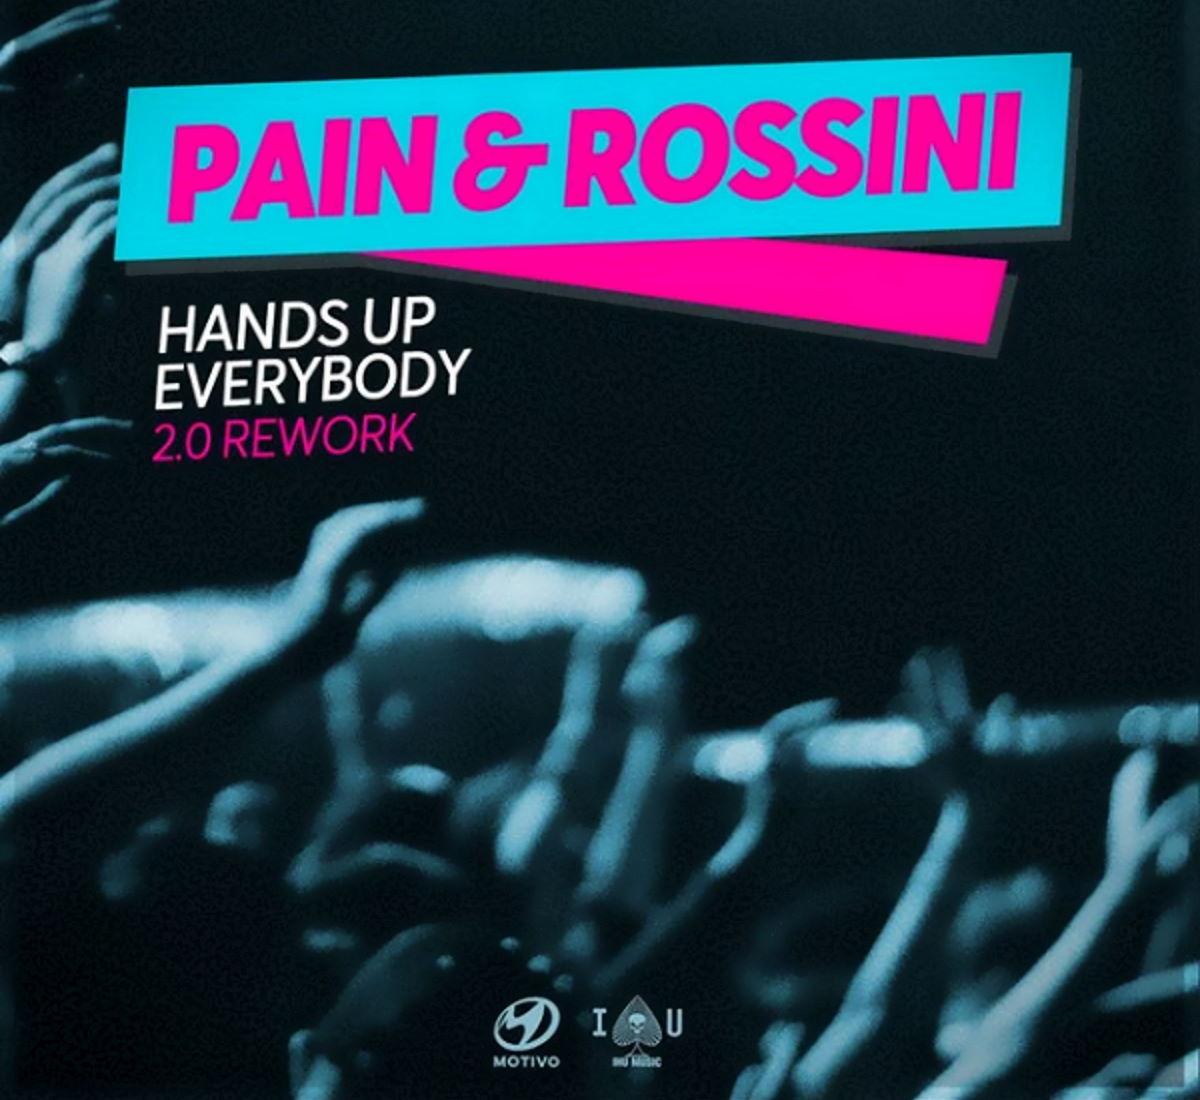 Pain & Rossini - Hands Up Everybody 2.0 Rework (Motivo)